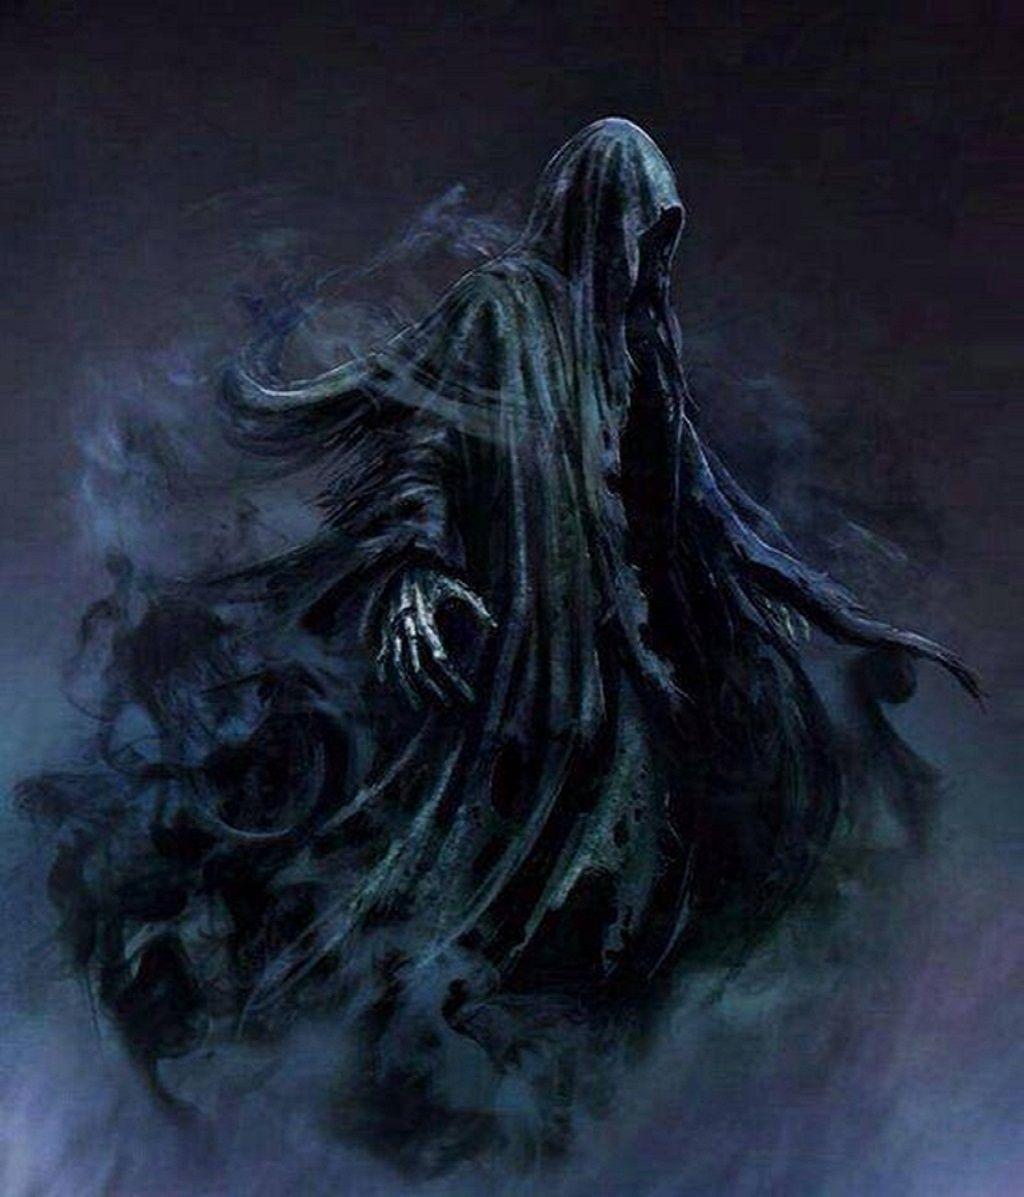 In the movie Prisoner Of Azkaban the dementors were